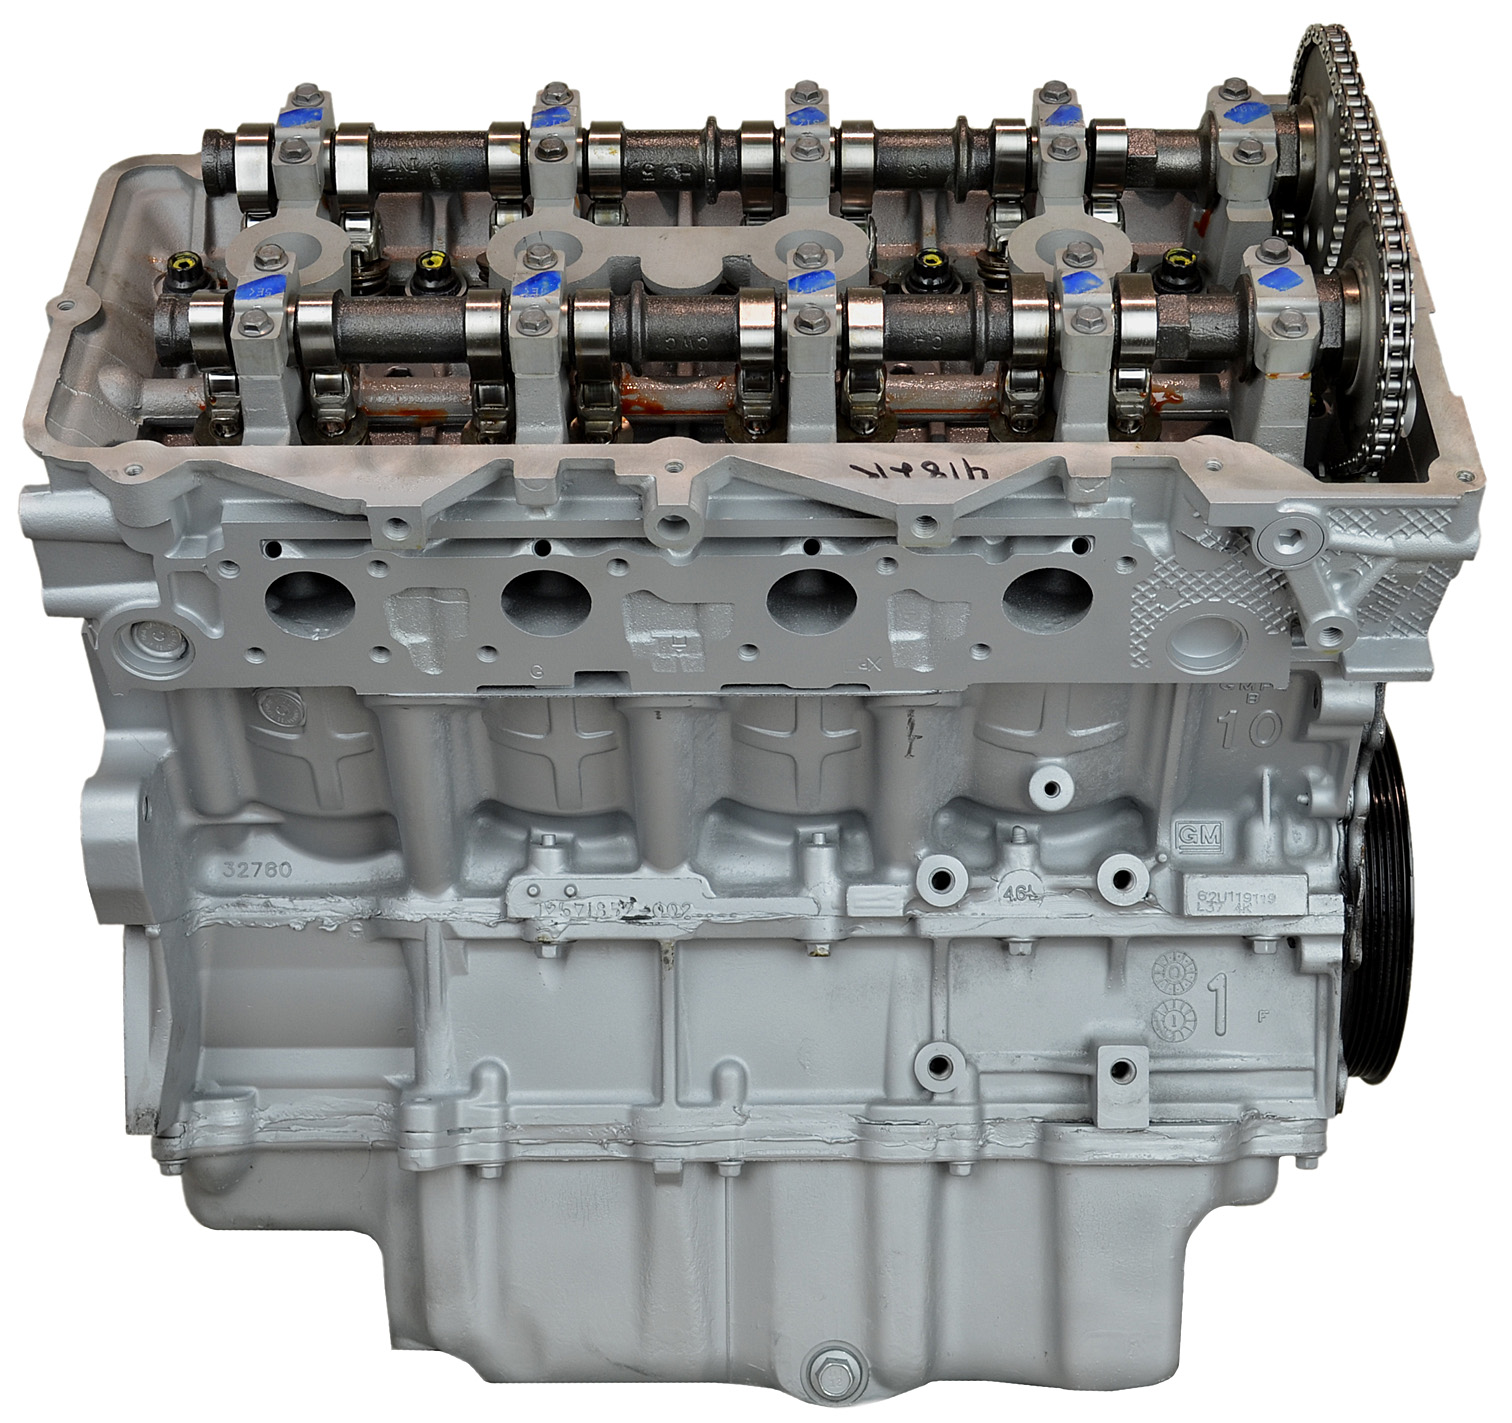 00-02 Cadillac Seville 4.6 NorthStar Engine VIN 9